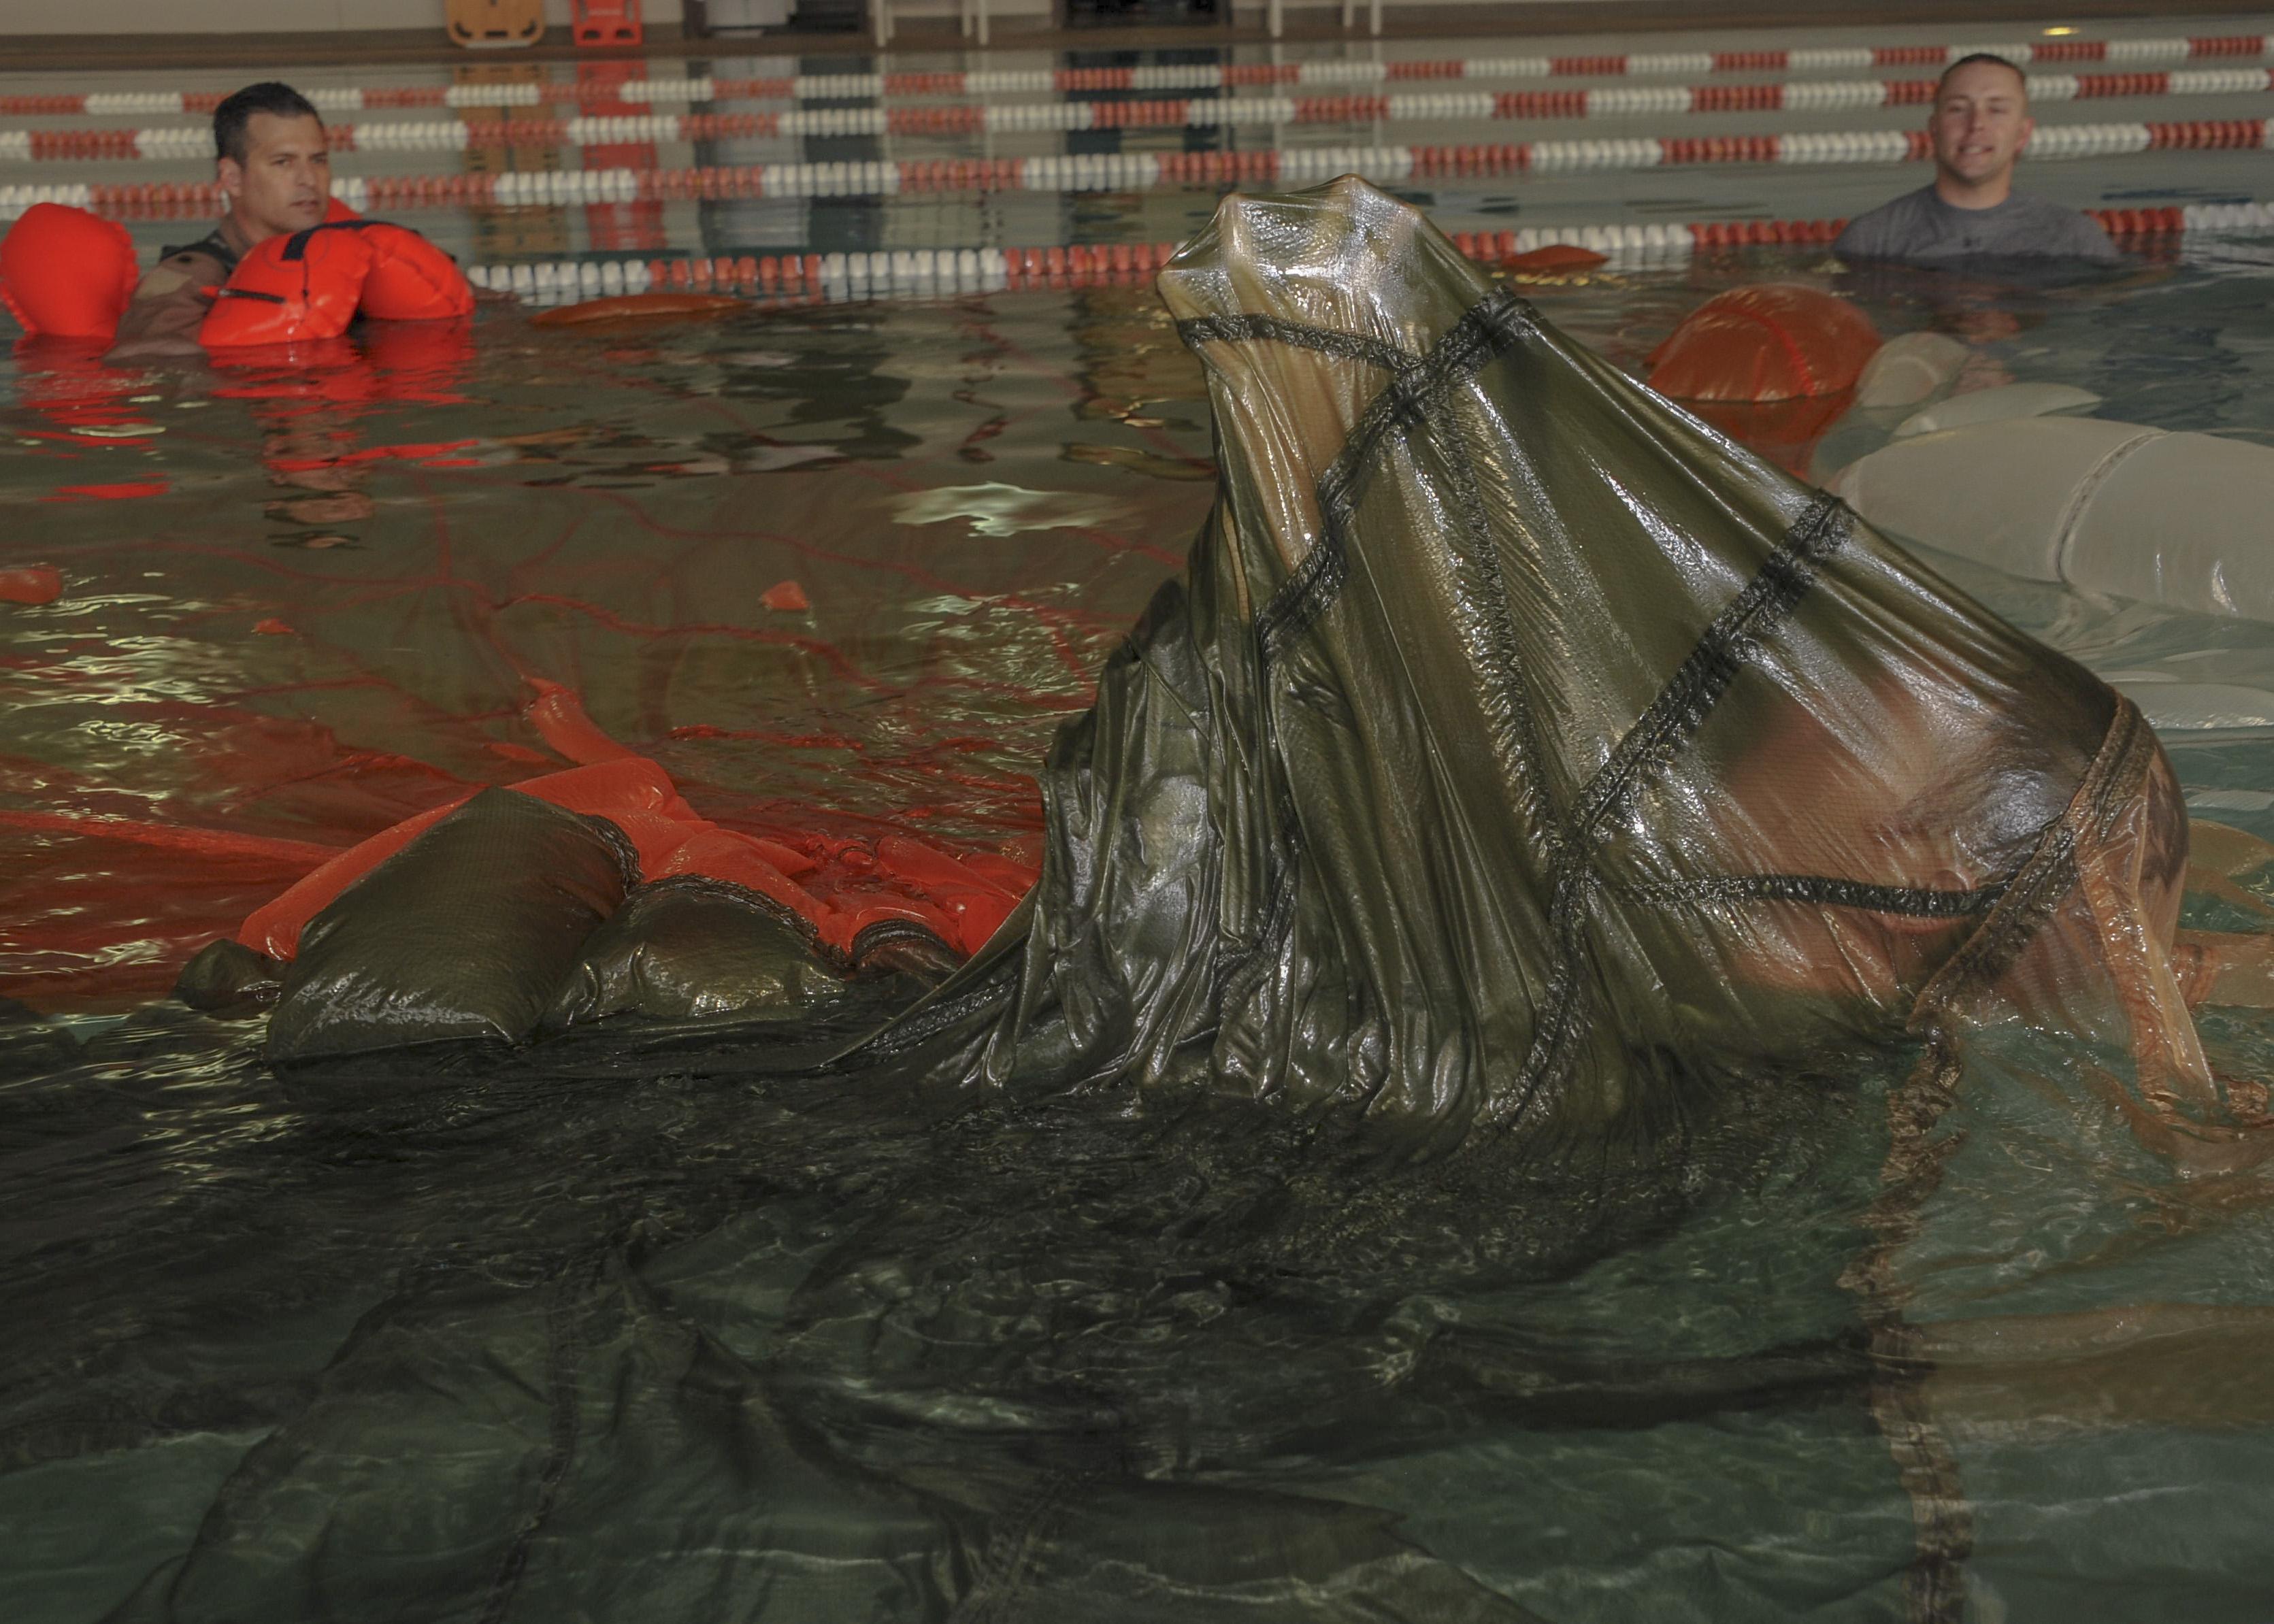 SERE water survival training > Davis-Monthan Air Force Base